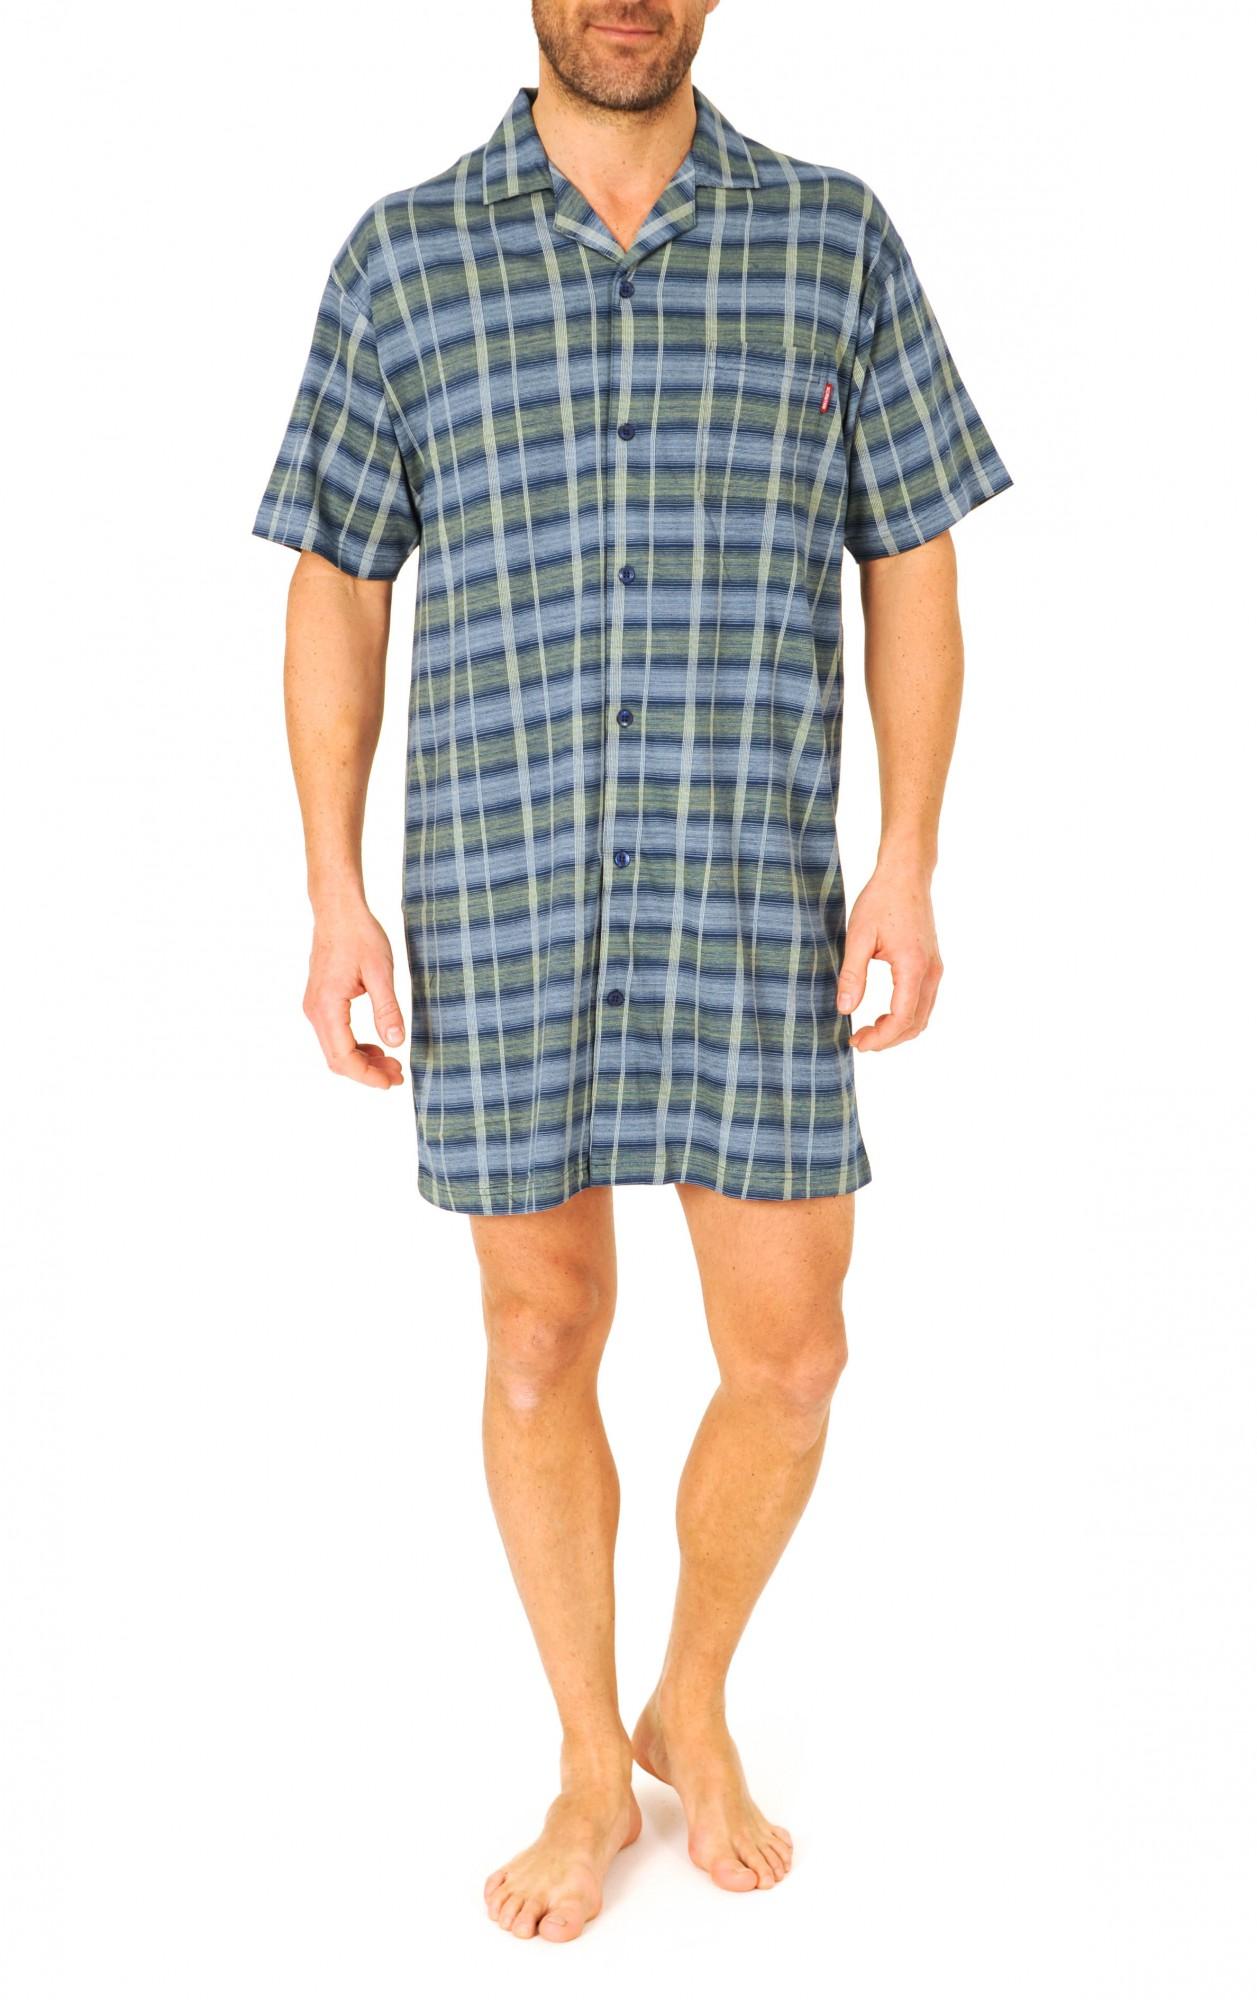 Herren Pflegenachthemd kurzarm, 53045